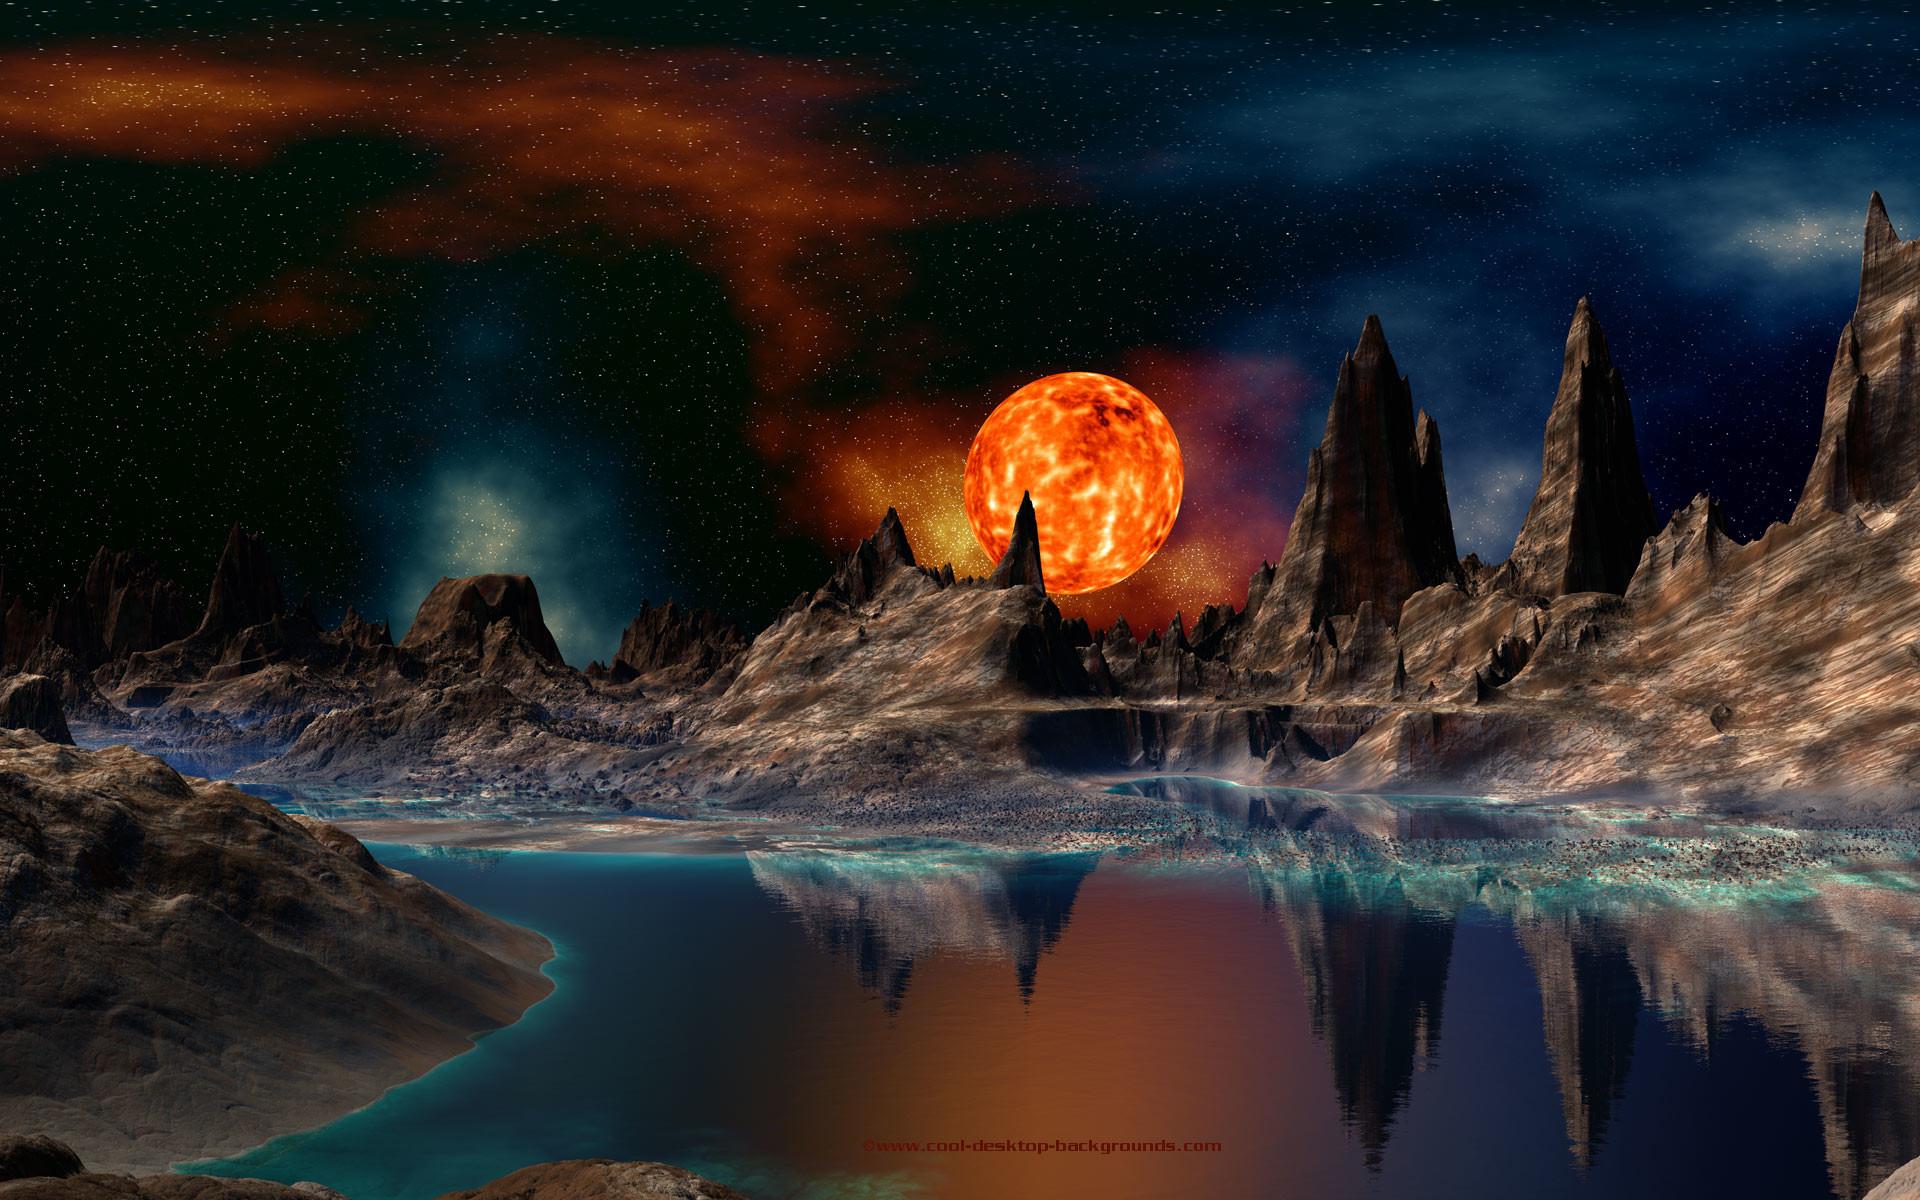 Epic Space Wallpaper: Epic Desktop Background (68+ Images